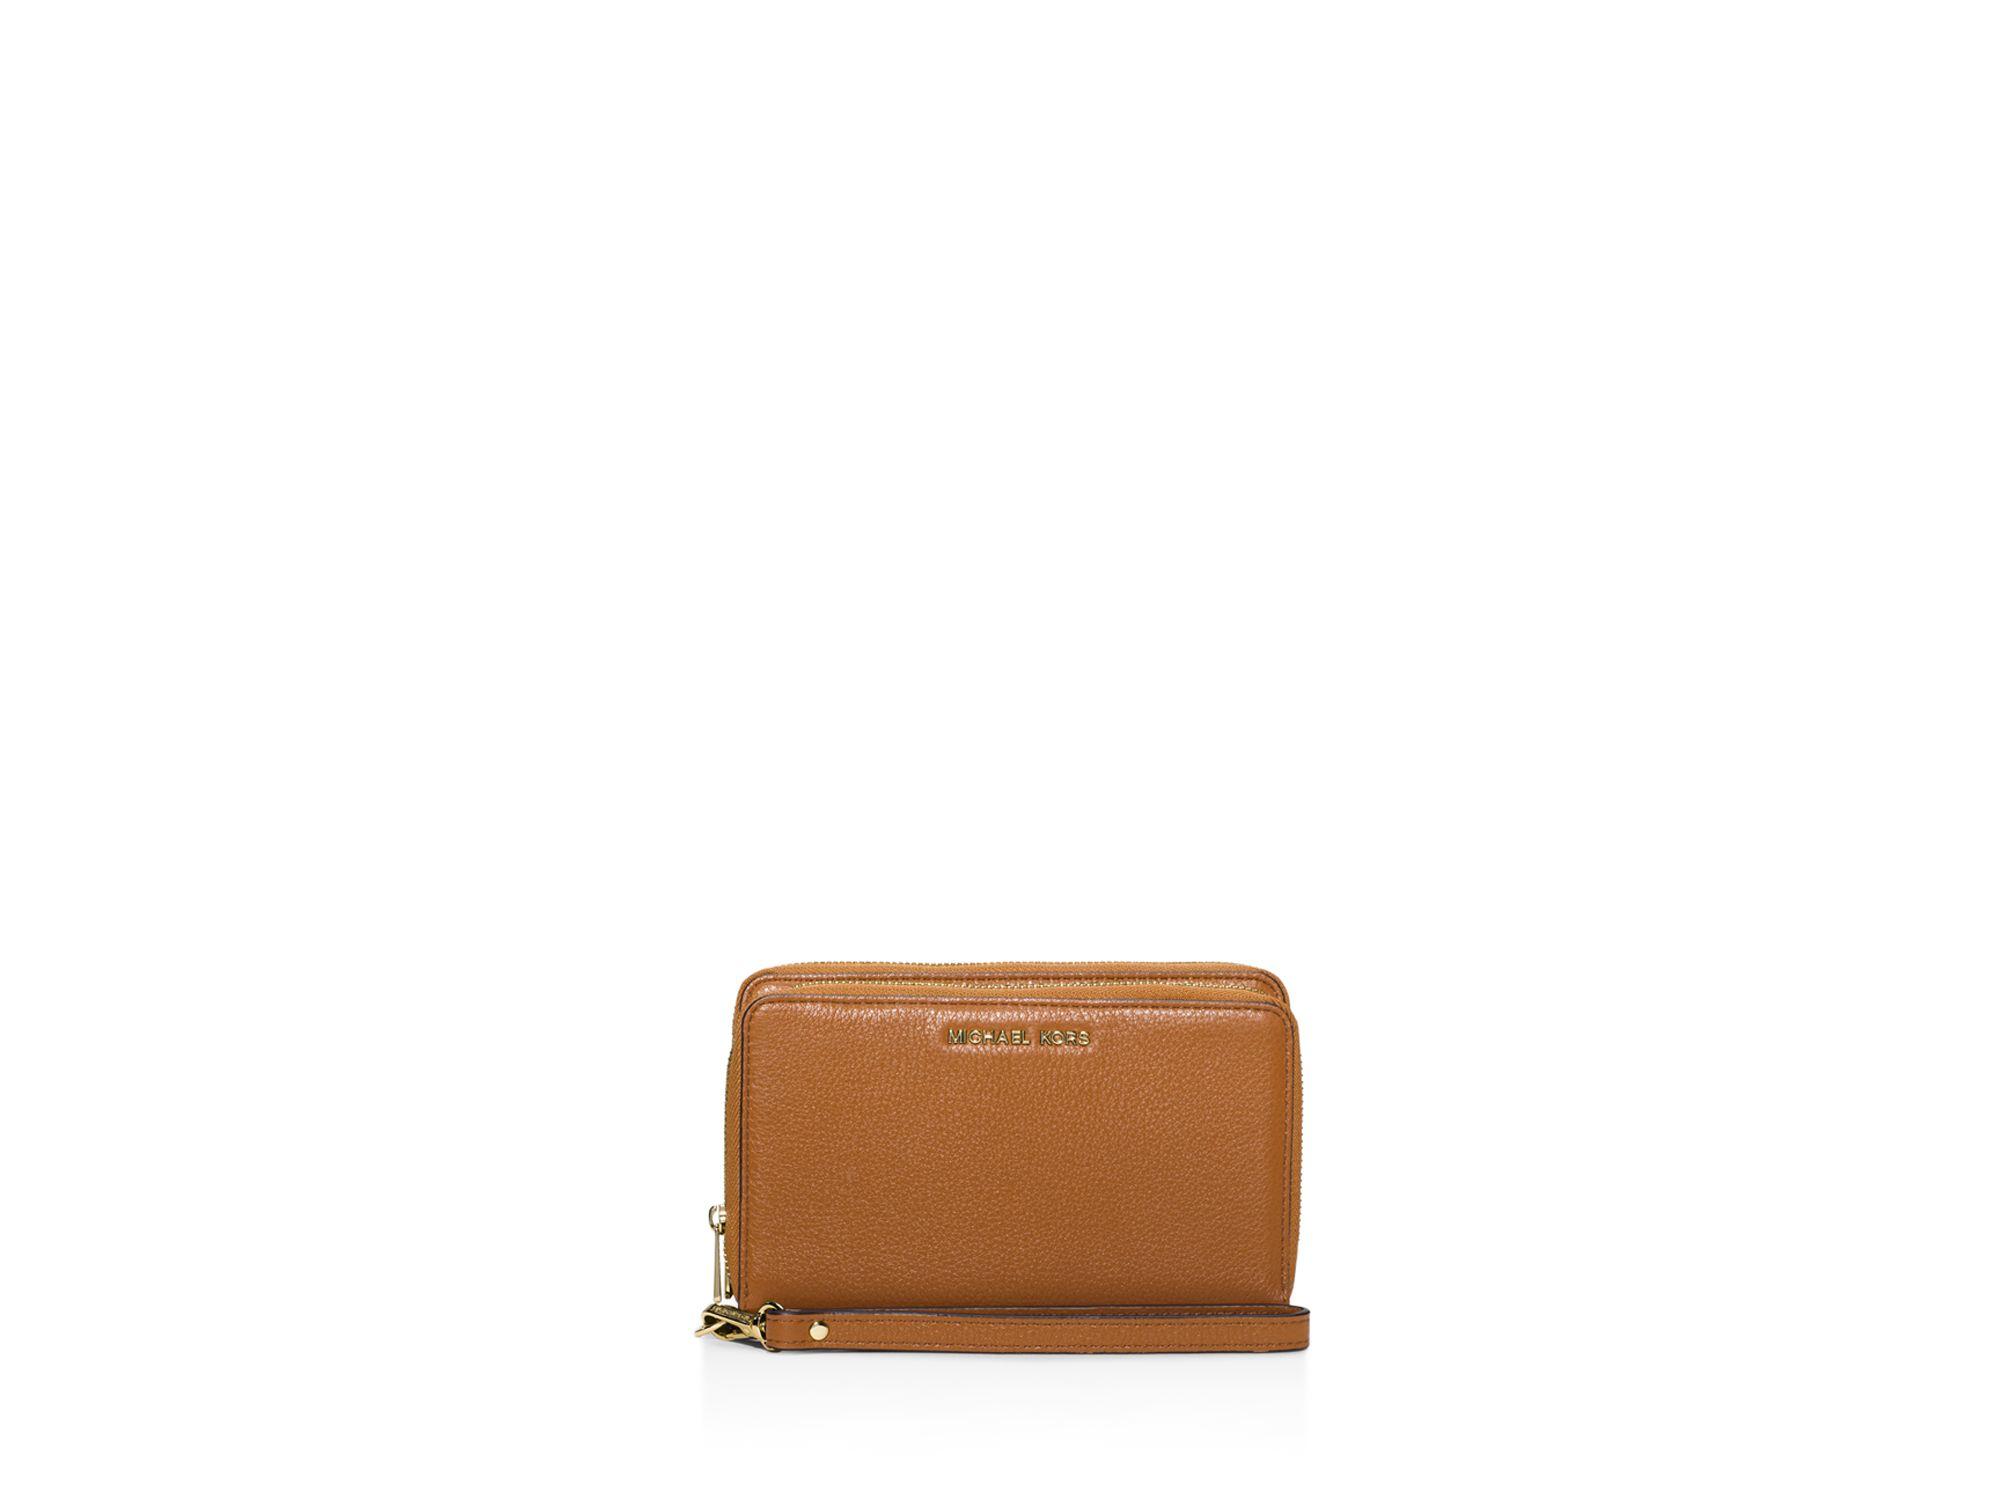 78f3808ea2b3 Lyst - MICHAEL Michael Kors Adele Large Flat Multifunction Wallet